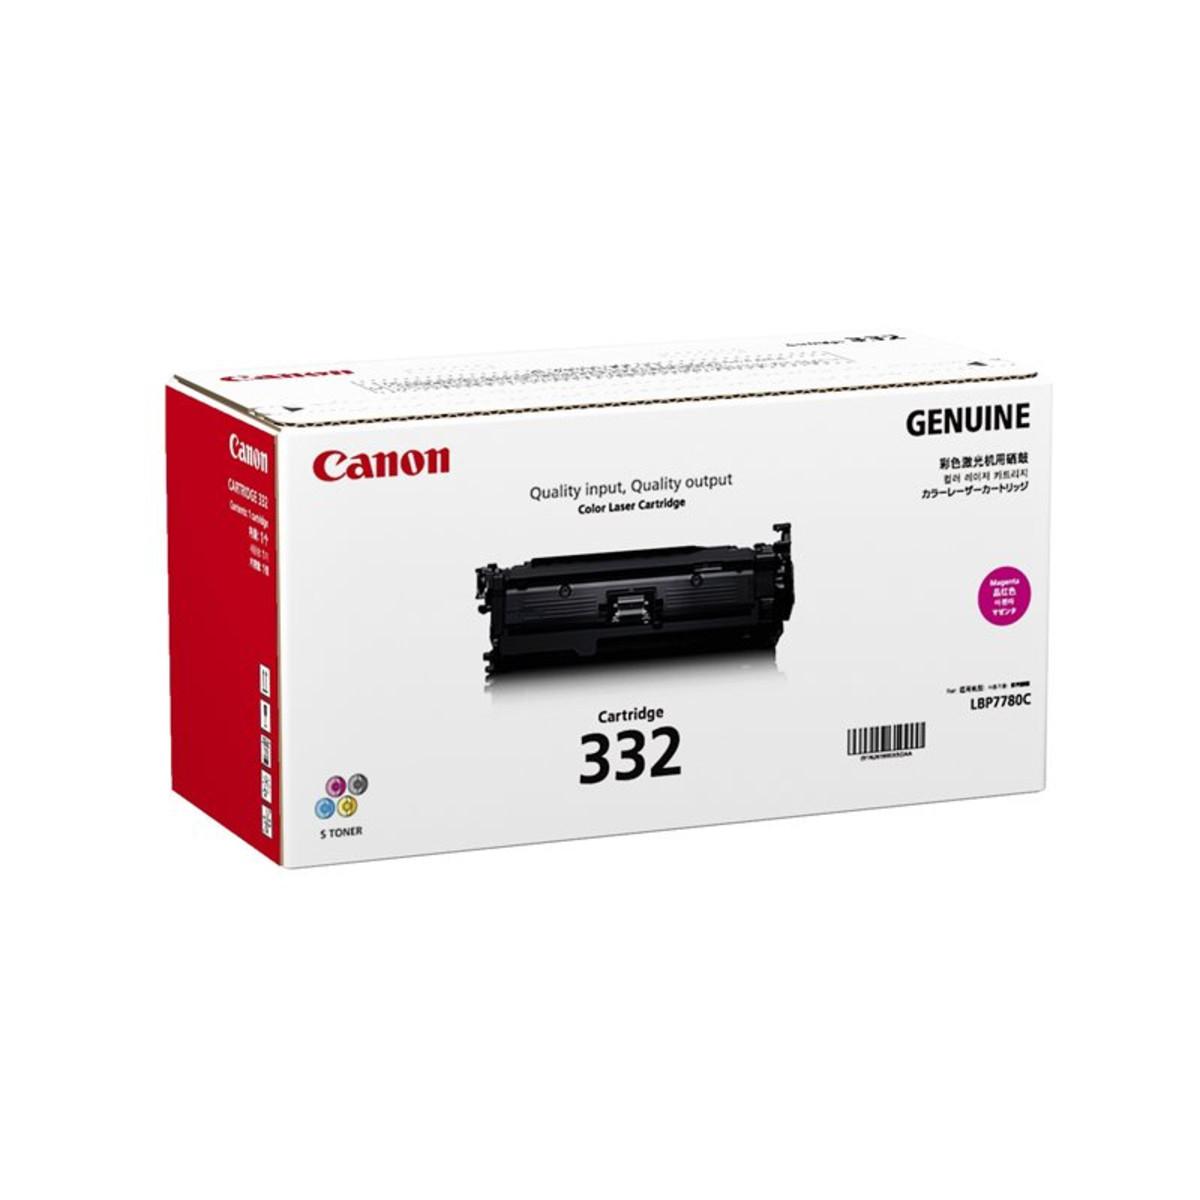 Canon CART-332M Magenta Toner Cartridge